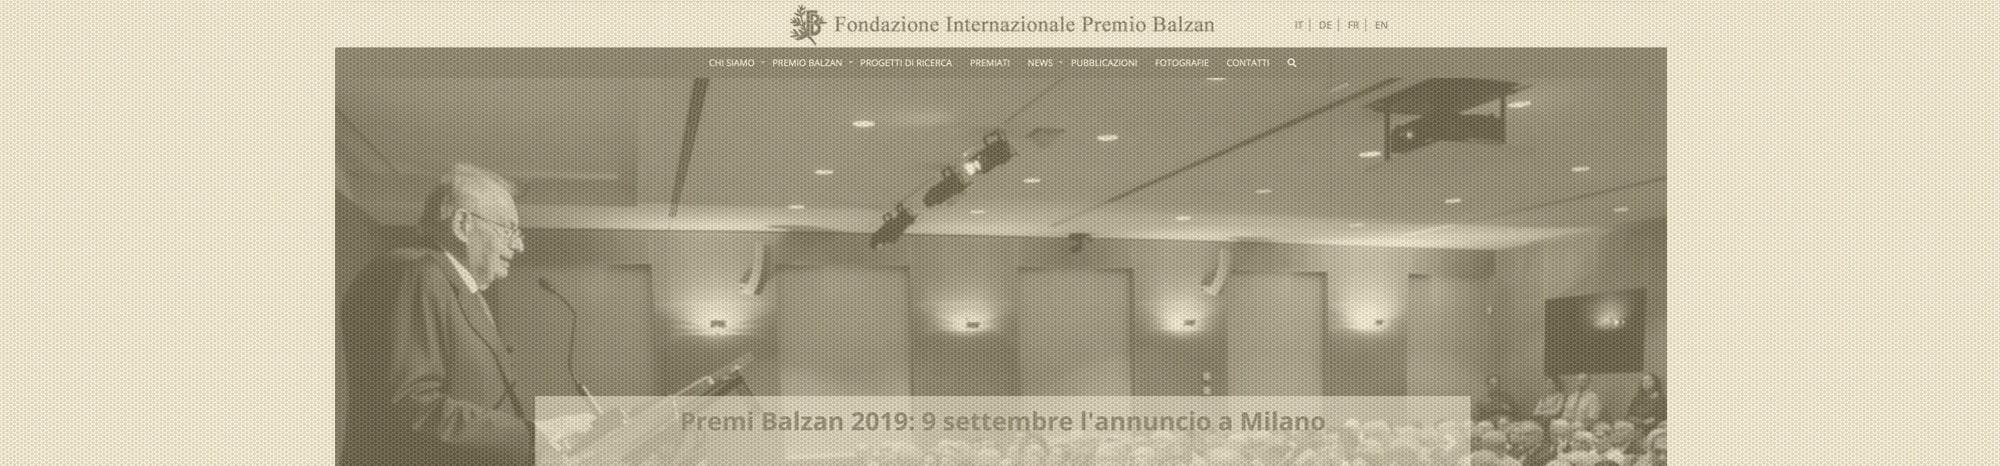 Fondazione Balzan